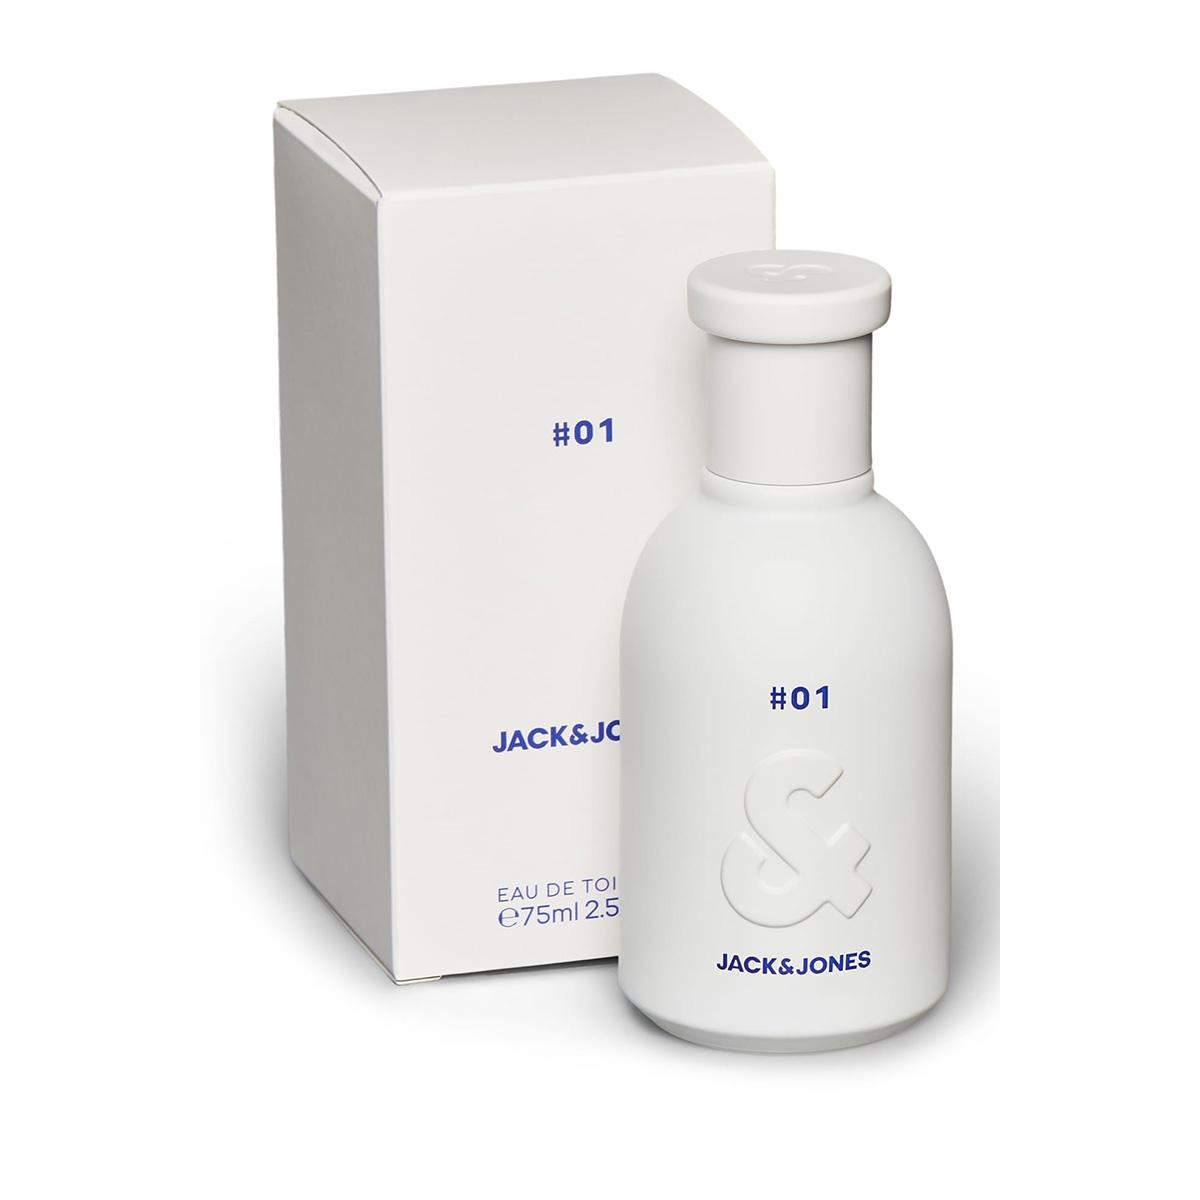 jac 01 white jj fragrance 75 ml 12164665 jack & jones accessoire white